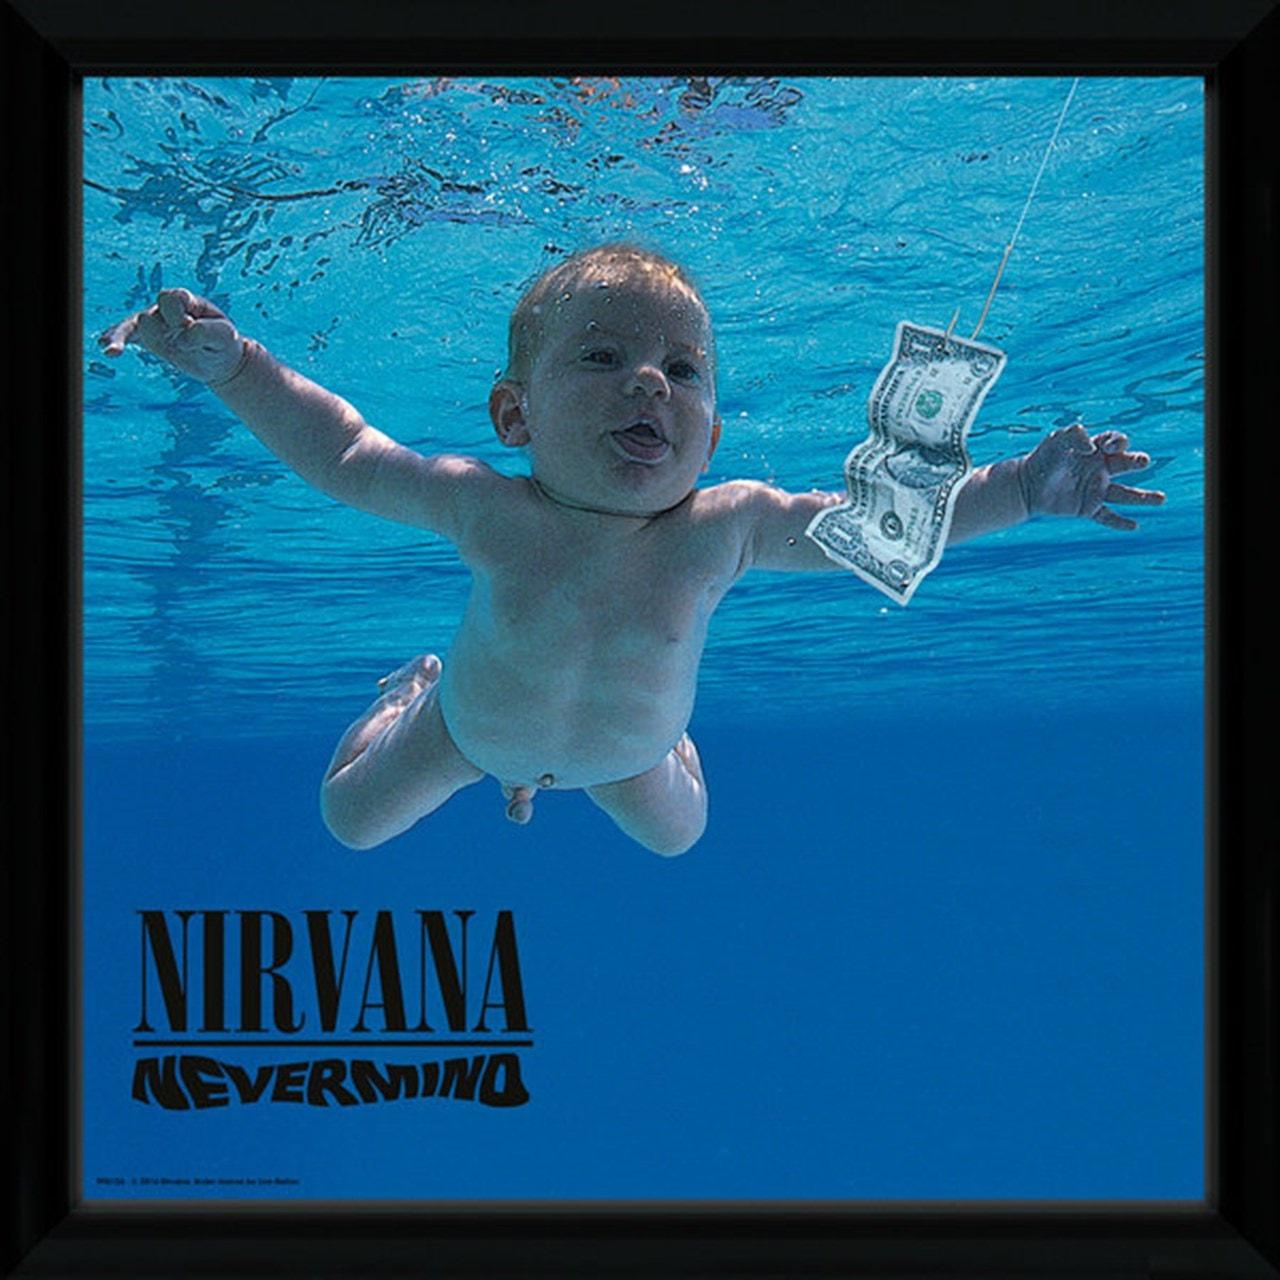 Nirvana Nevermind Framed Wall Art - 1